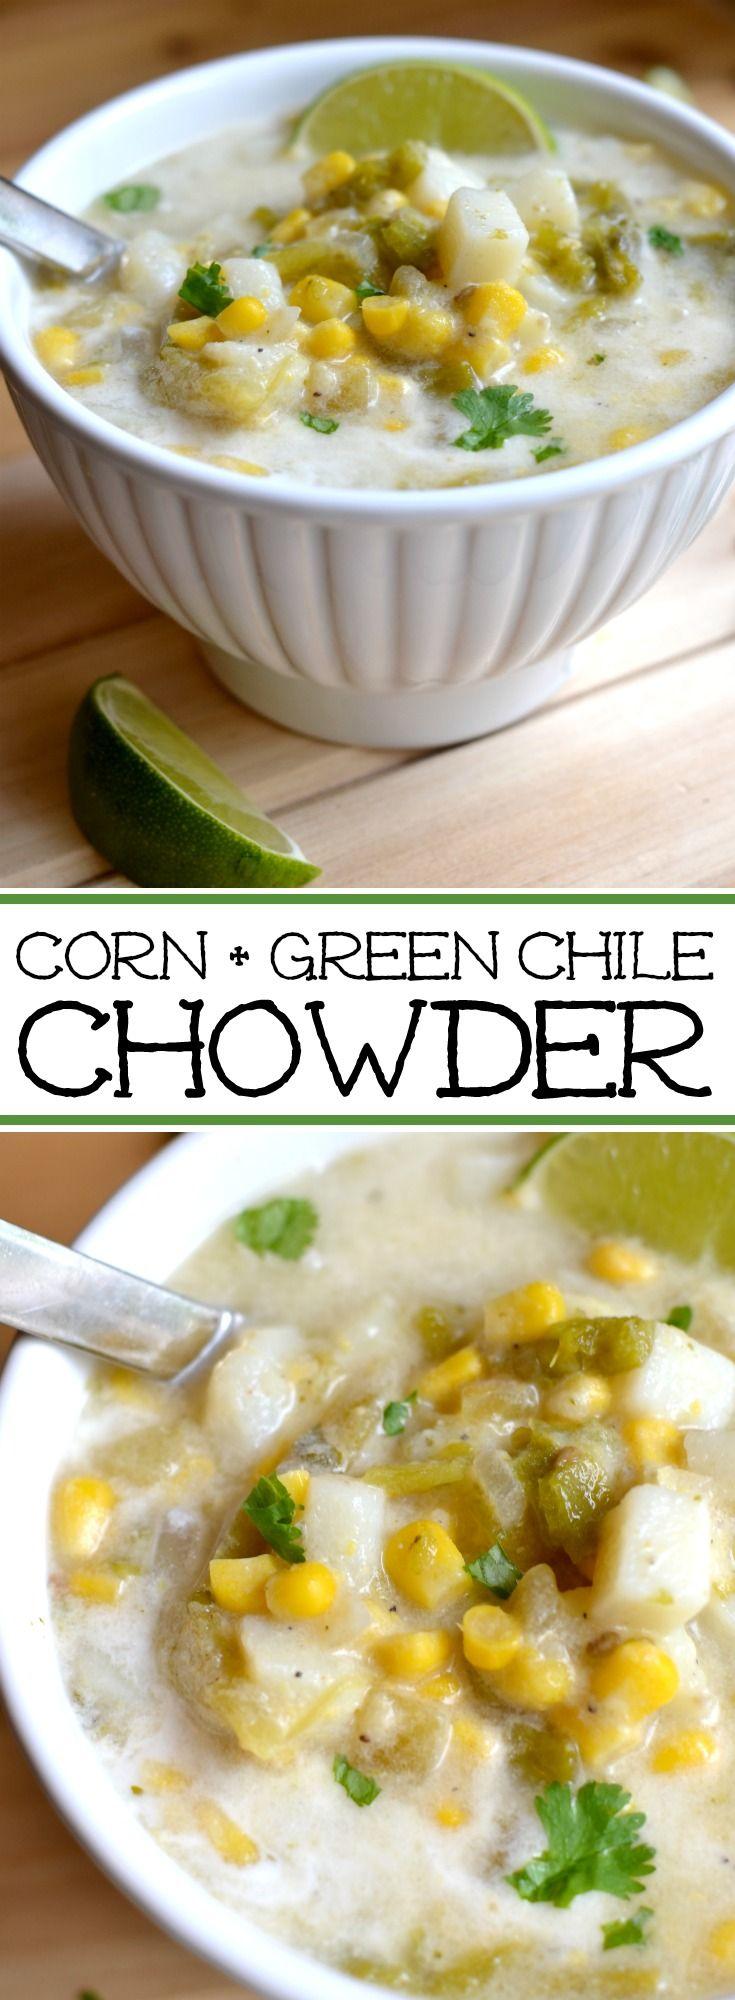 Potato, Green Chile and Corn Chowder